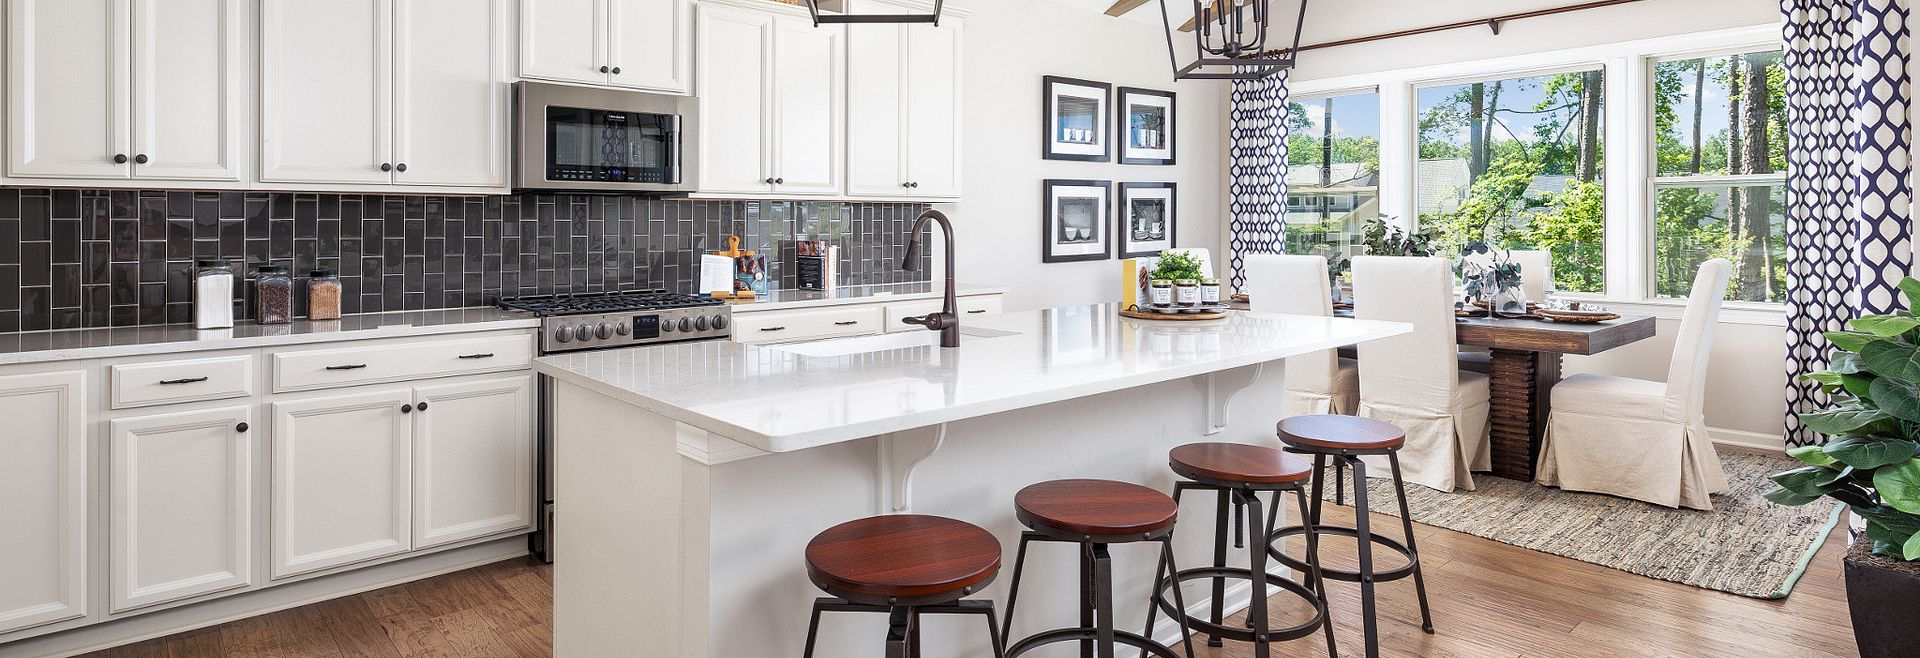 Everett Model Kitchen & Breakfast